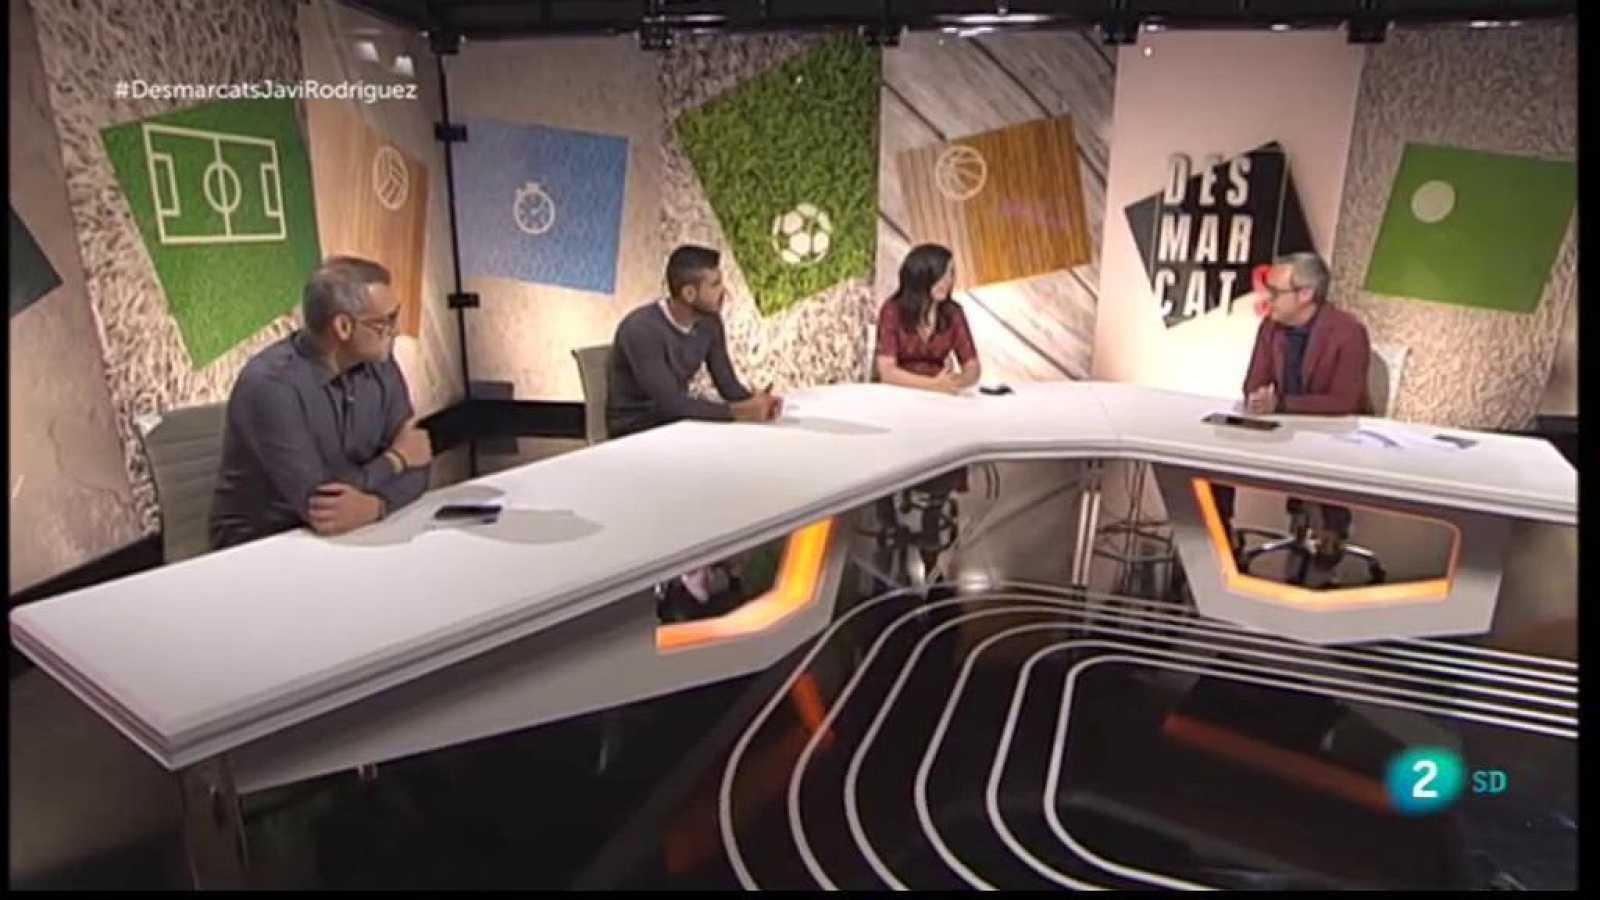 Desmarcats - Tertúlia esportiva. Referèndum al FC Barcelona